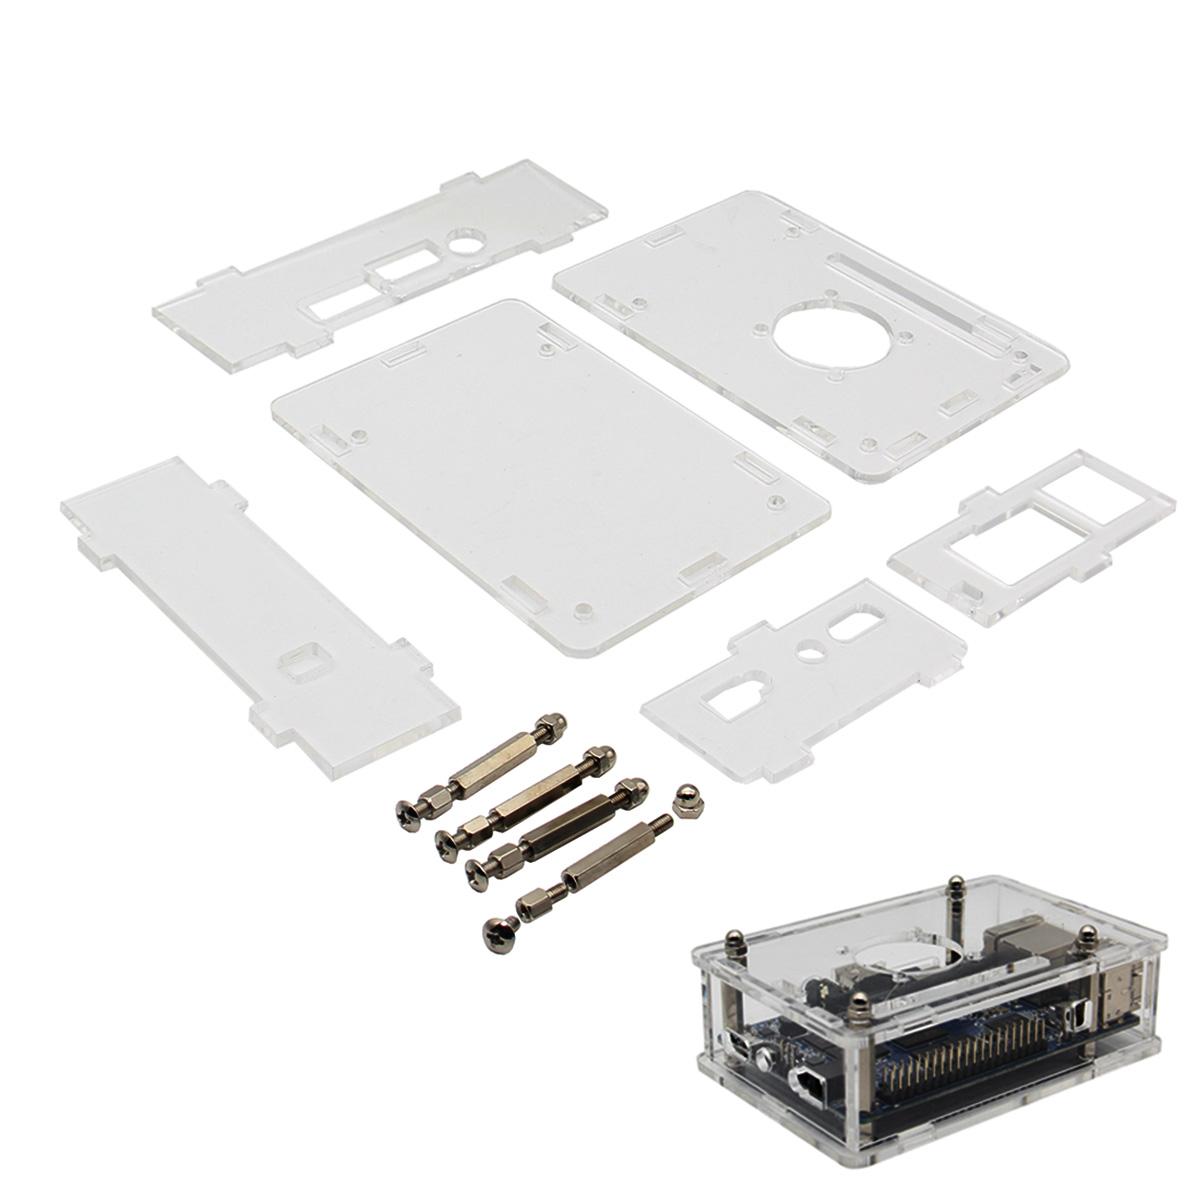 Acrylic Plastic Enclosure Box Shell For Orange Pi PC PC 2 Plus